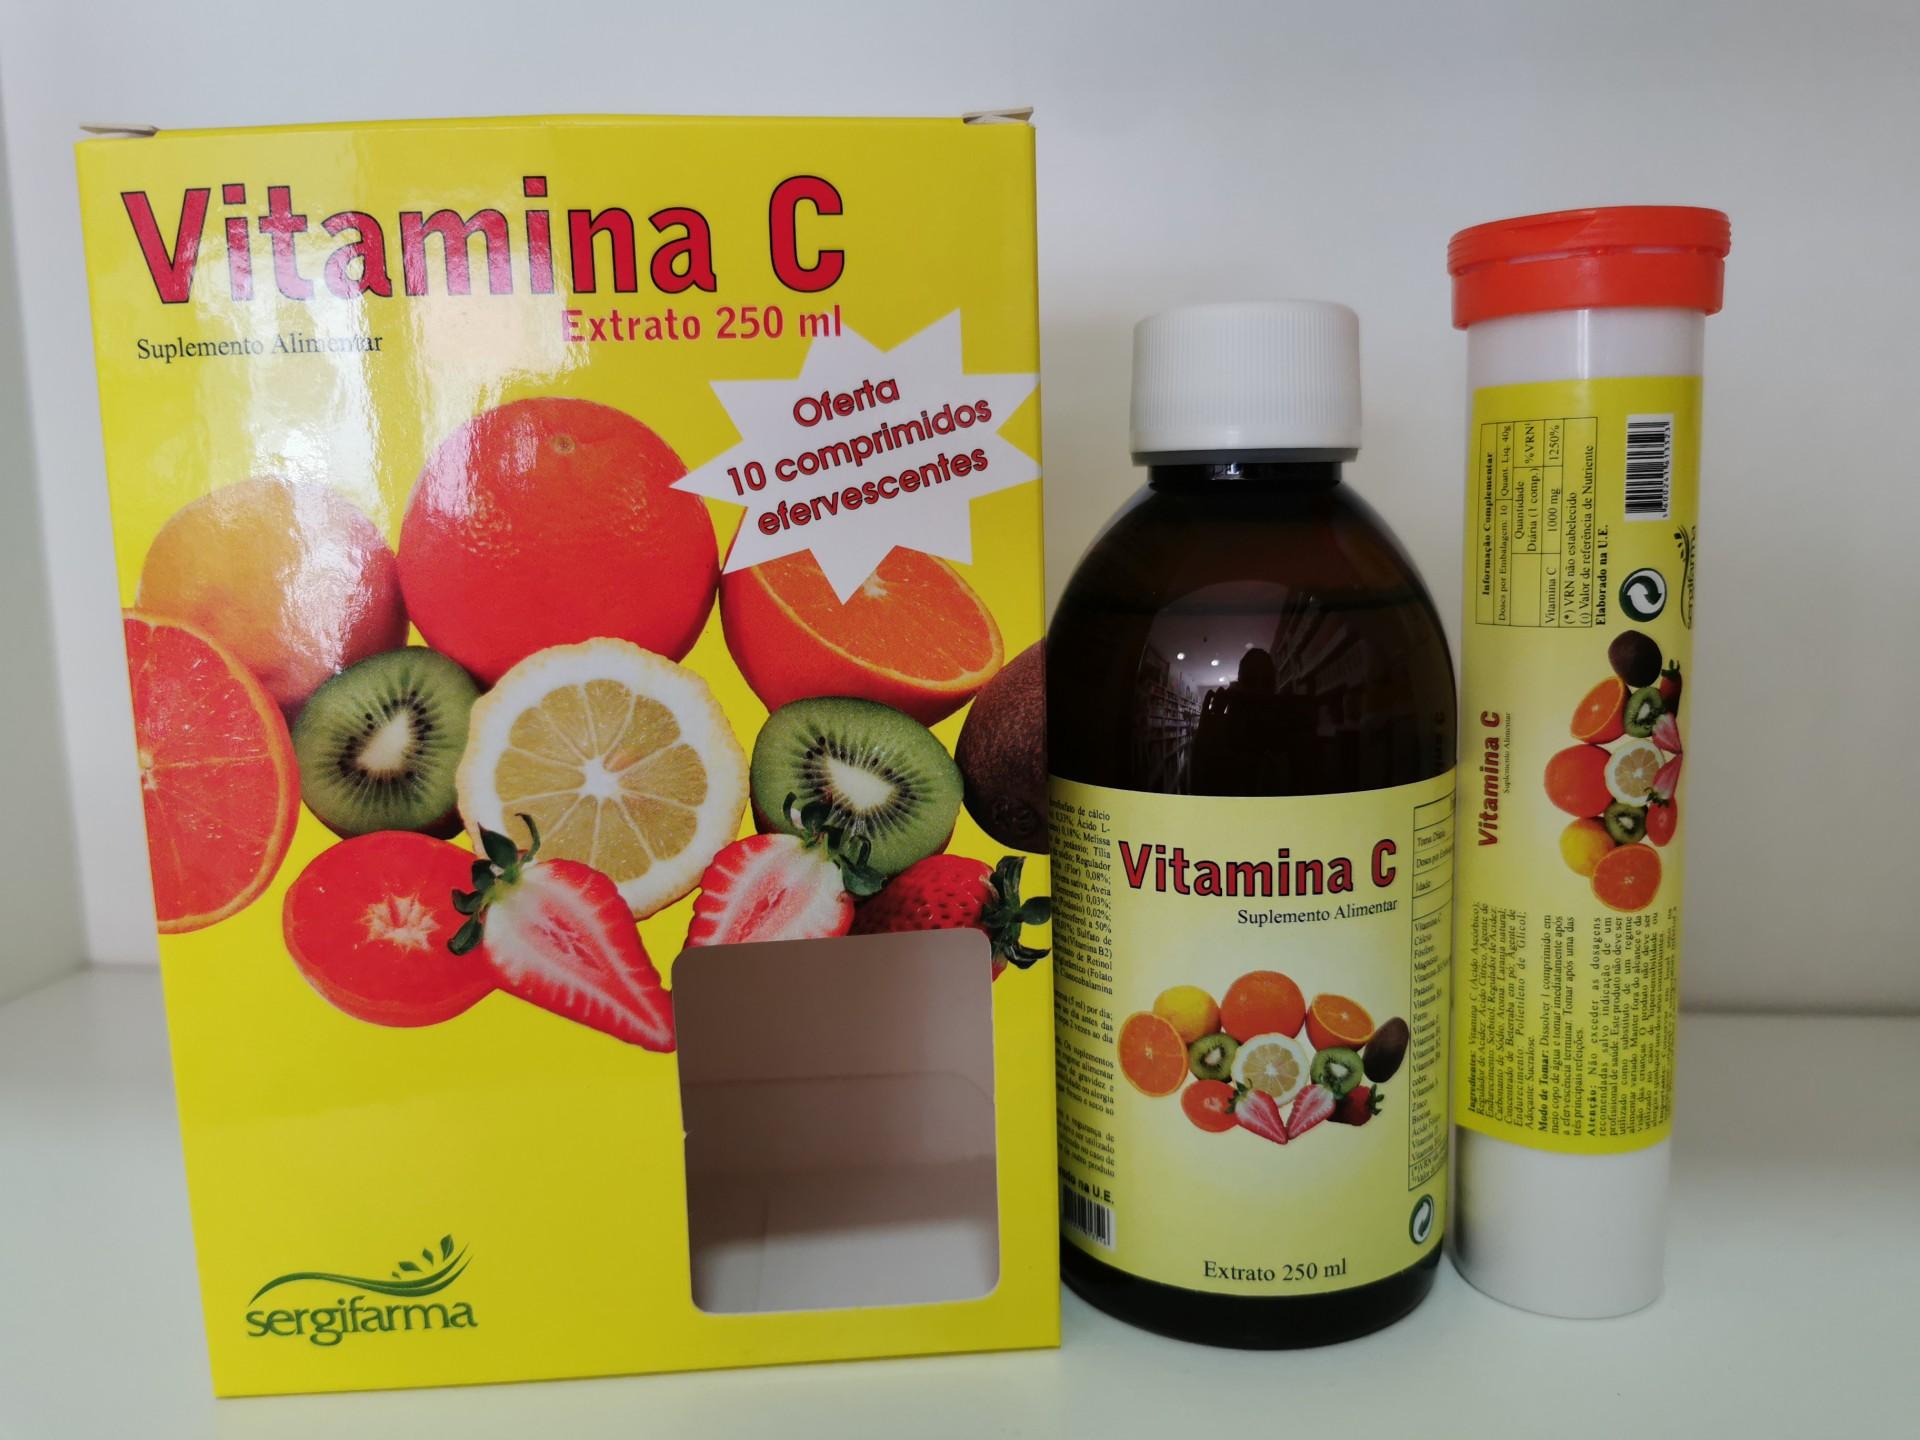 Vitamina C extrato